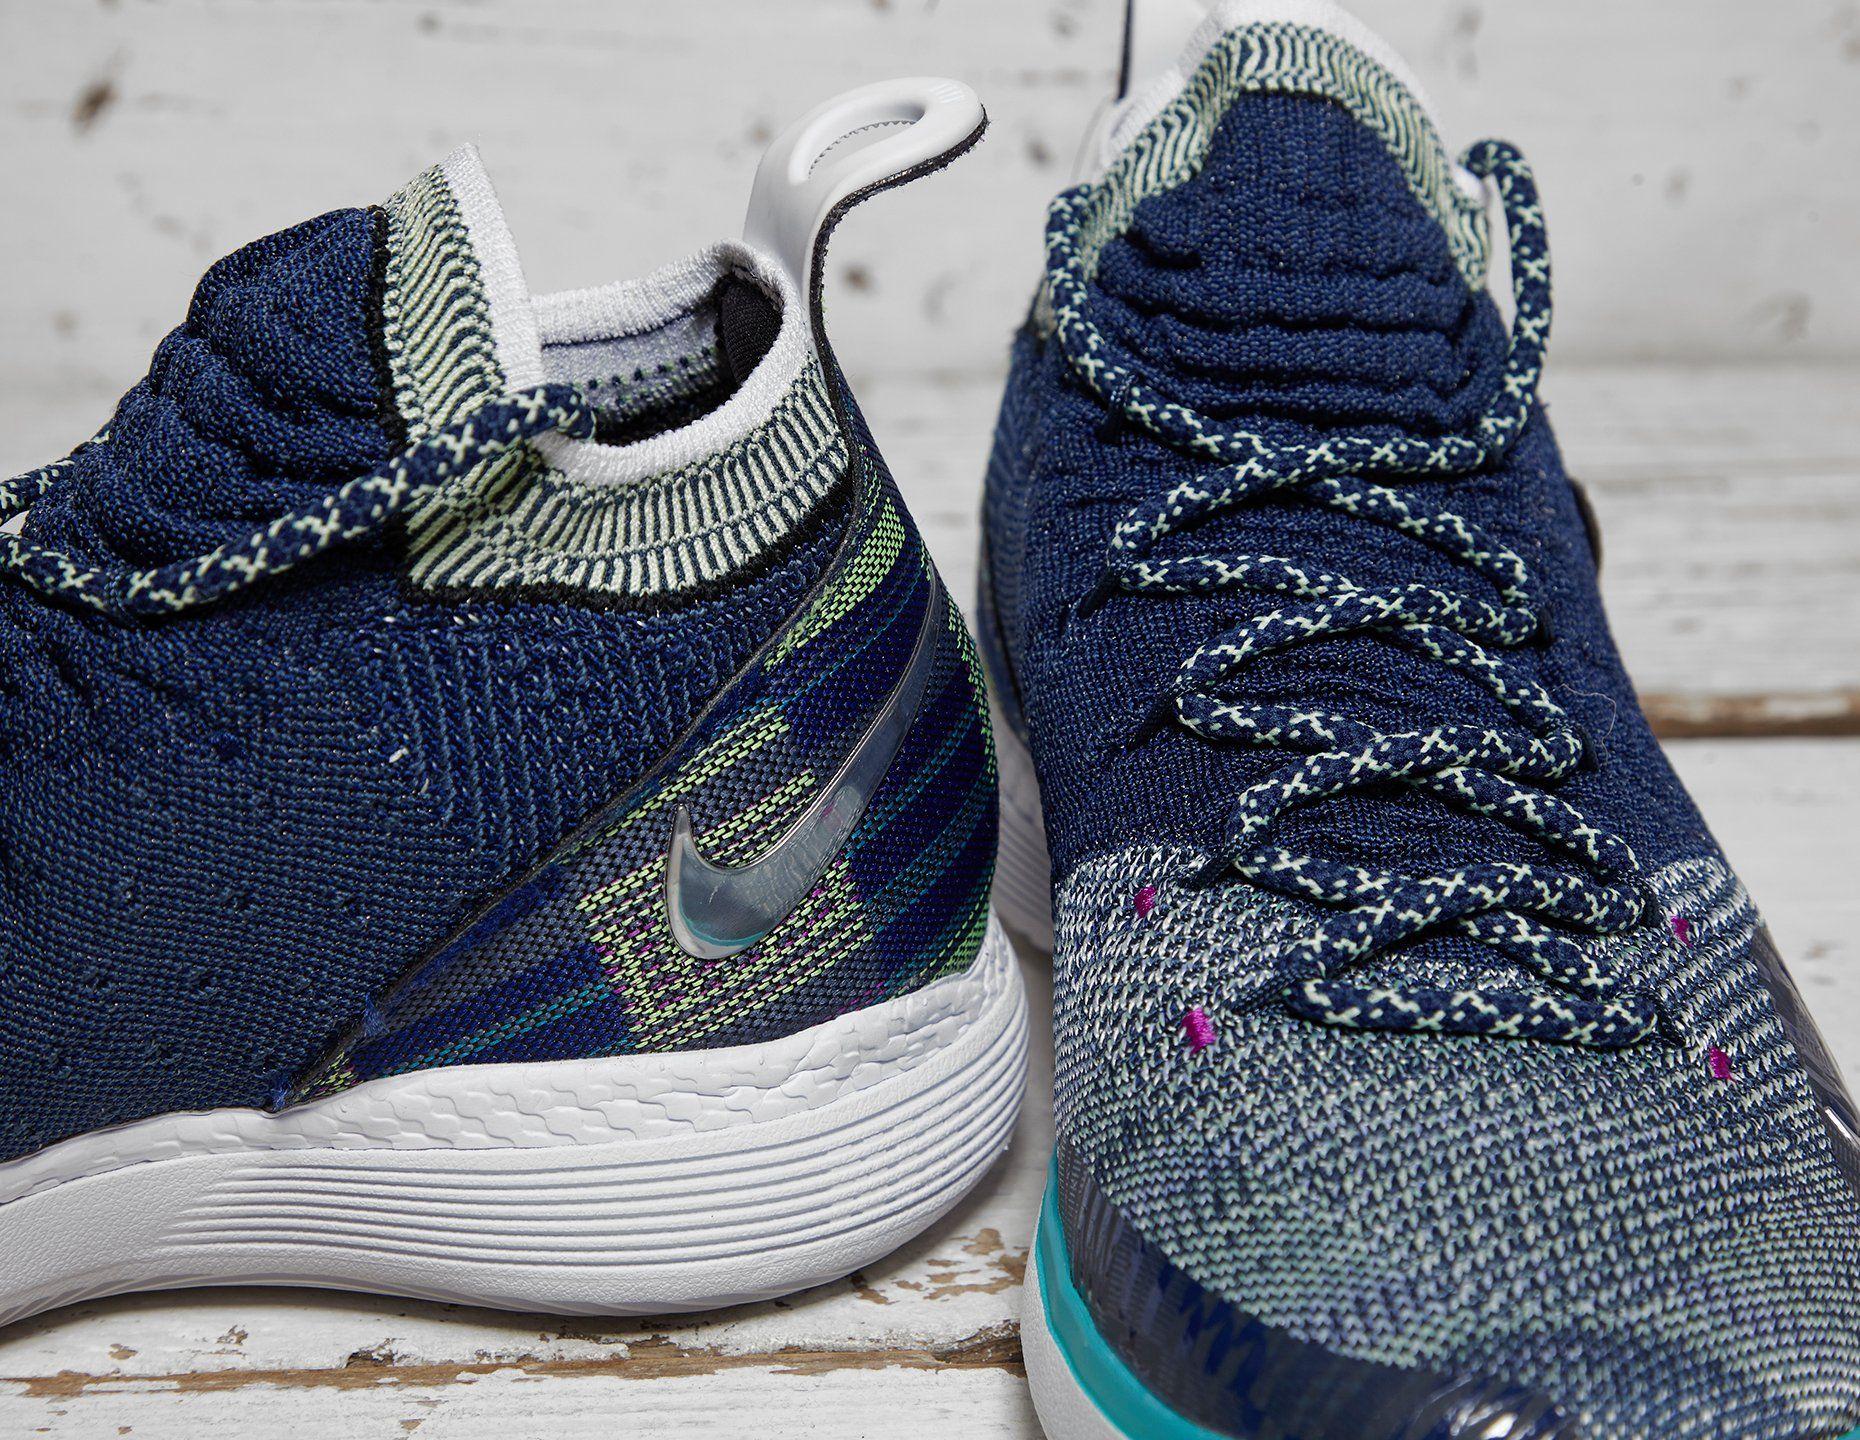 Nike Zoom KD 11 'Black History Month' QS